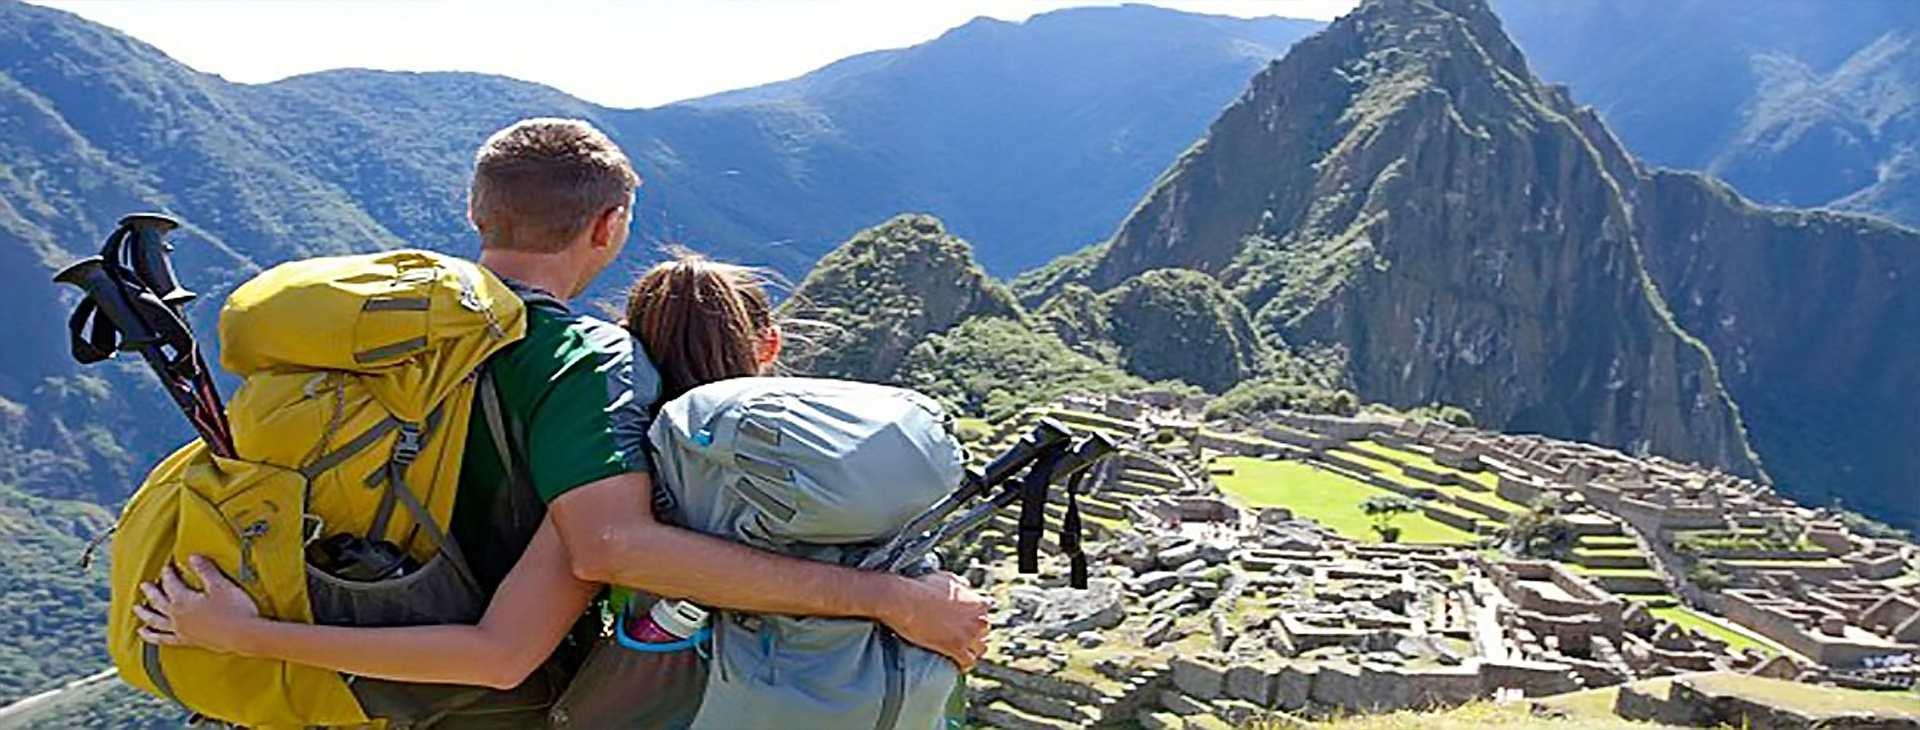 Paquete de Viajes – Tours Machu Picchu Panoramico 3dias - TOURS PERU MACHU PICCHU